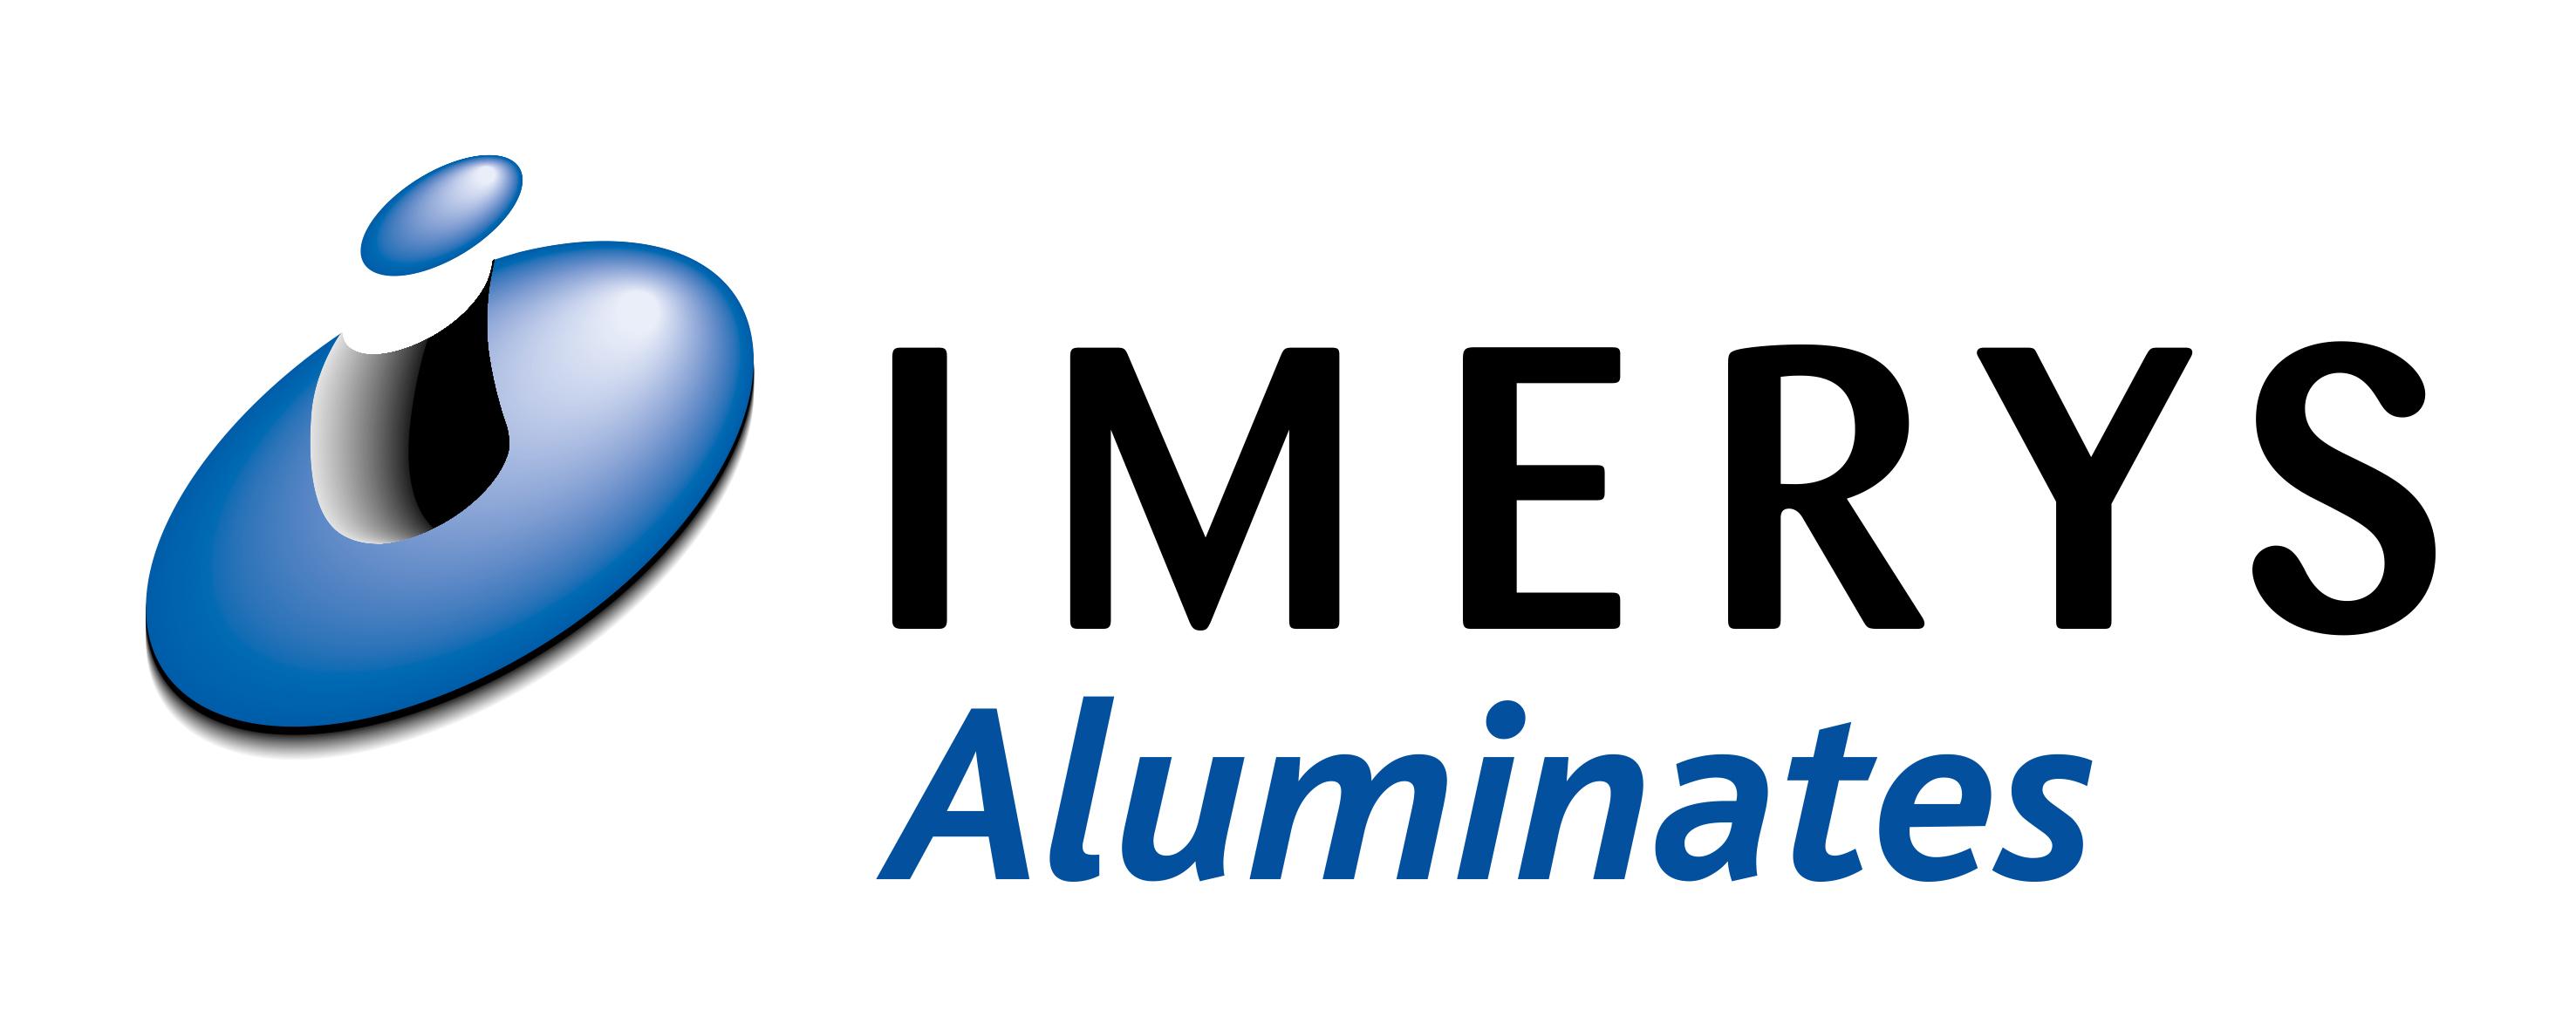 Imerys Aluminates